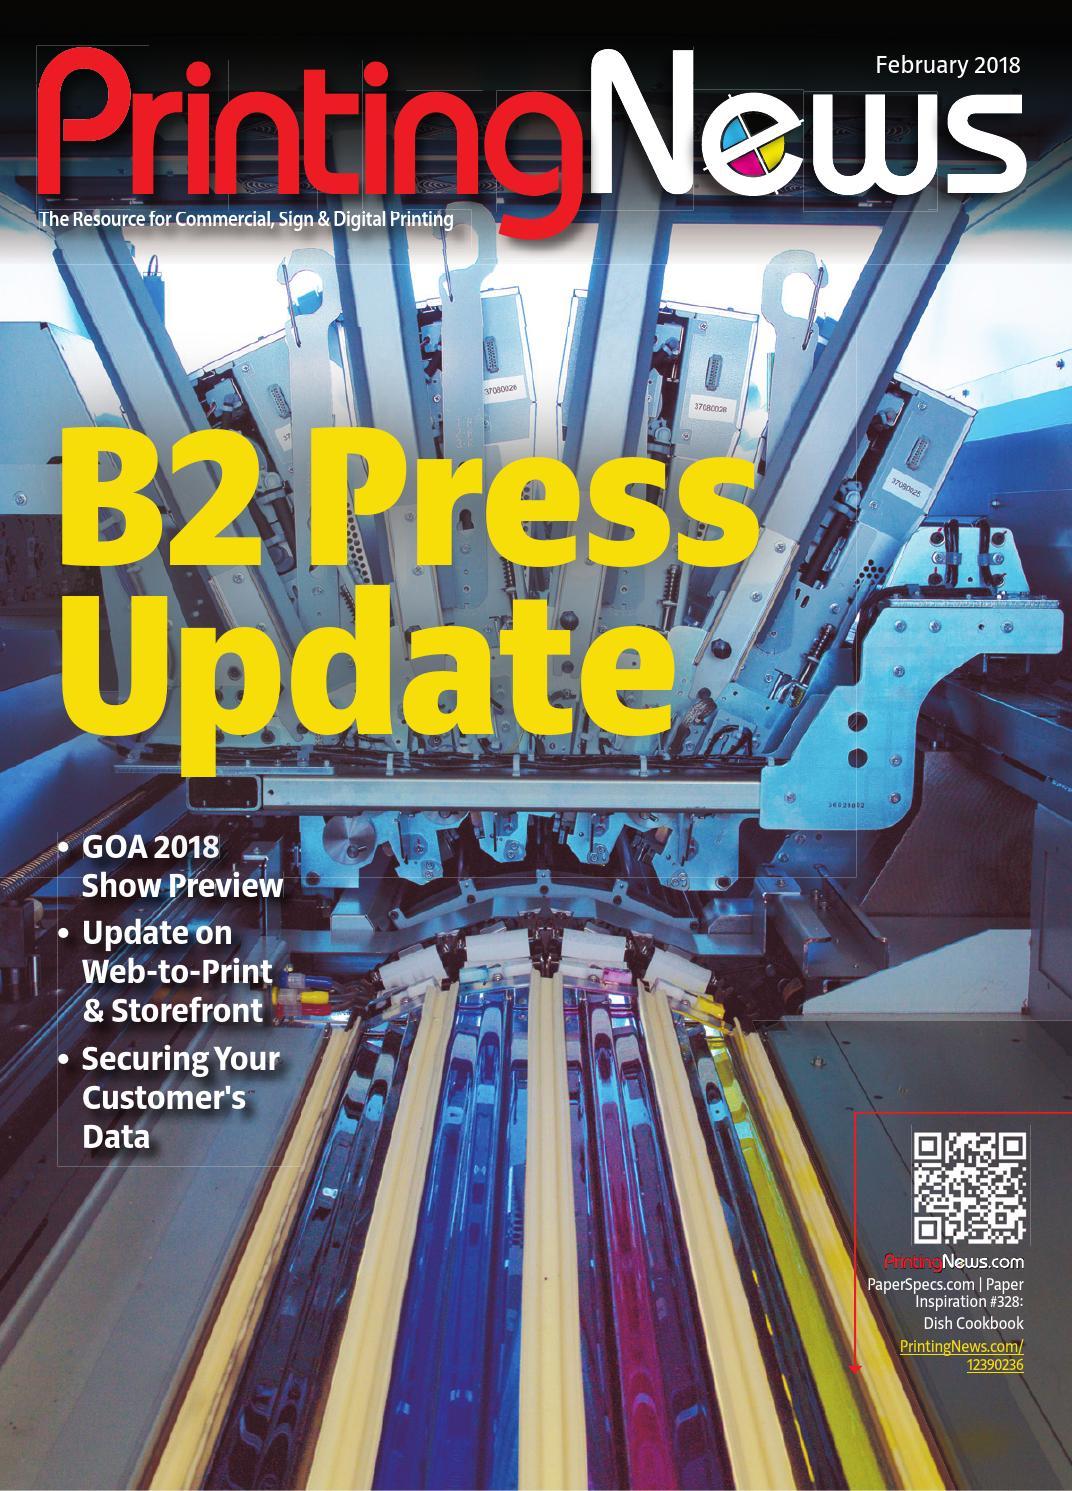 Printing News - February 2018 by WhatTheyThink - issuu